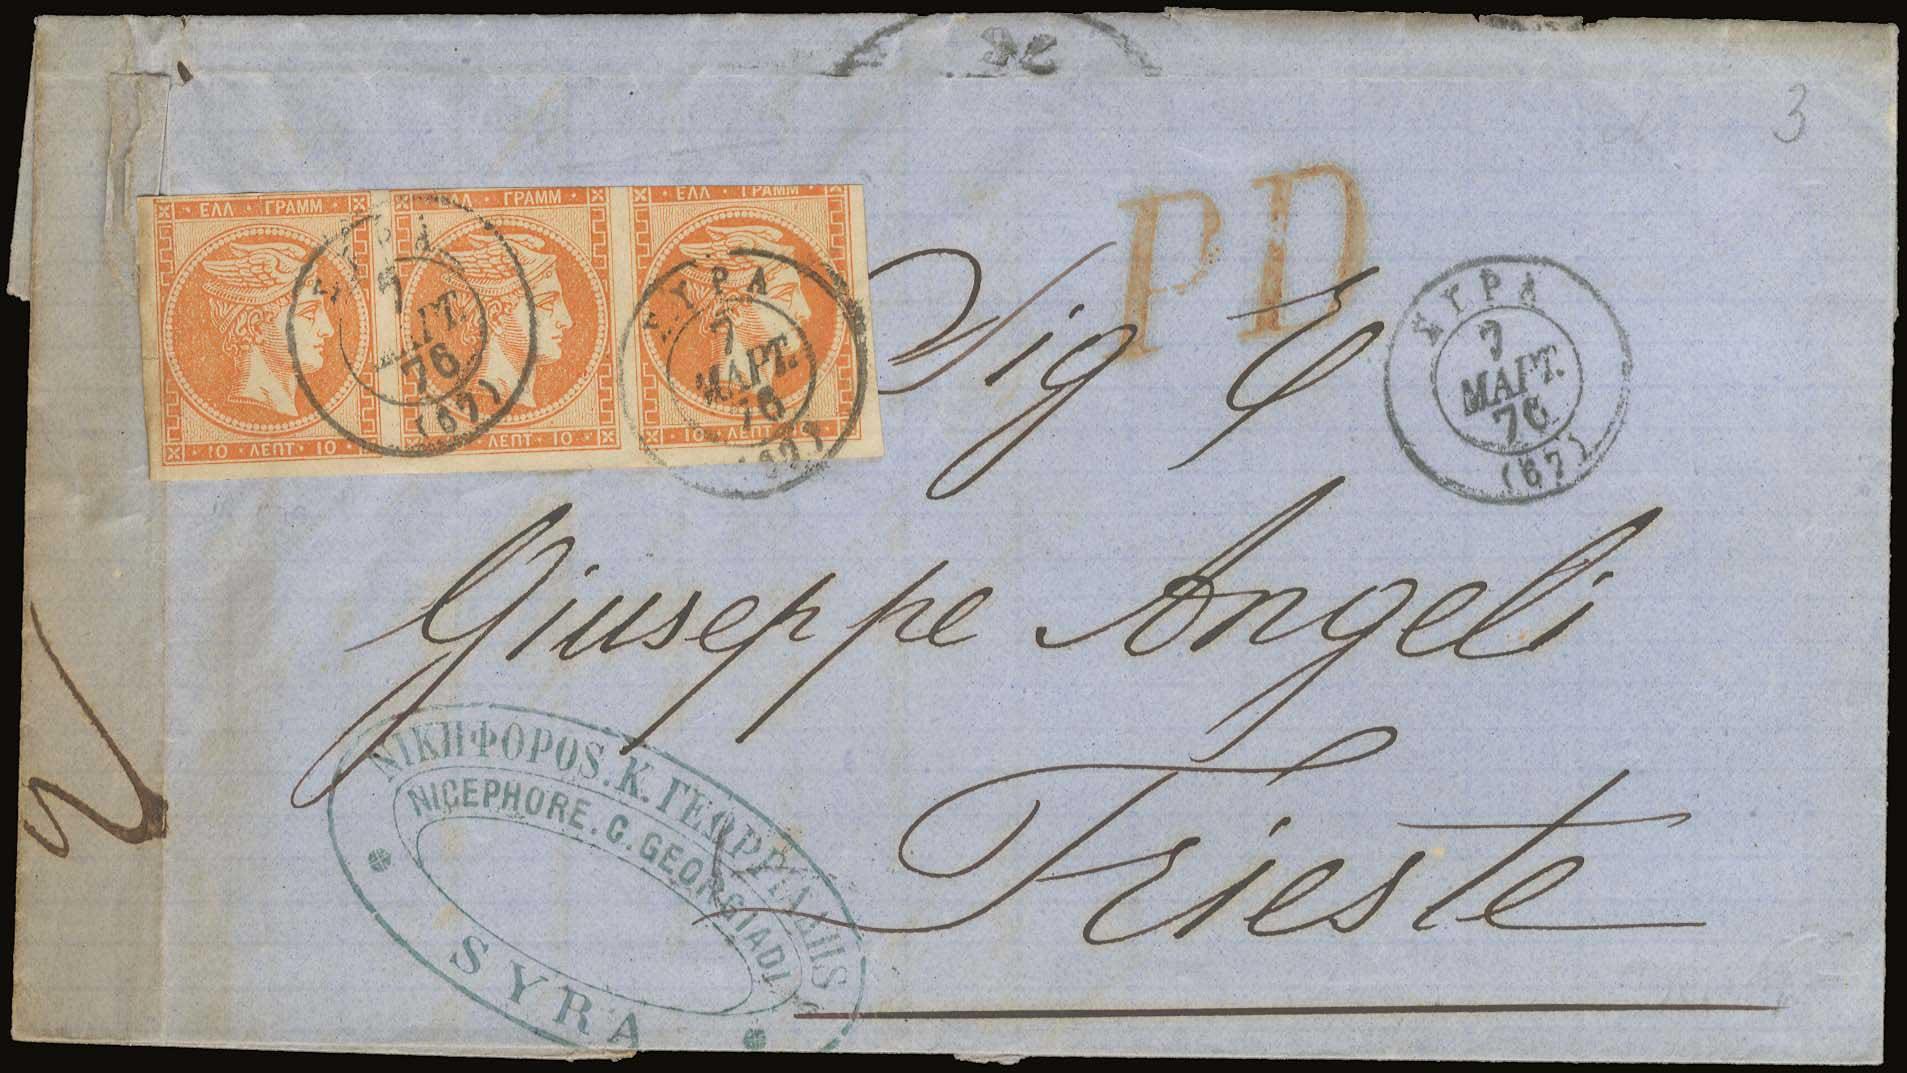 Lot 228 - -  LARGE HERMES HEAD 1875/80 cream paper -  A. Karamitsos Public Auction 639 General Stamp Sale